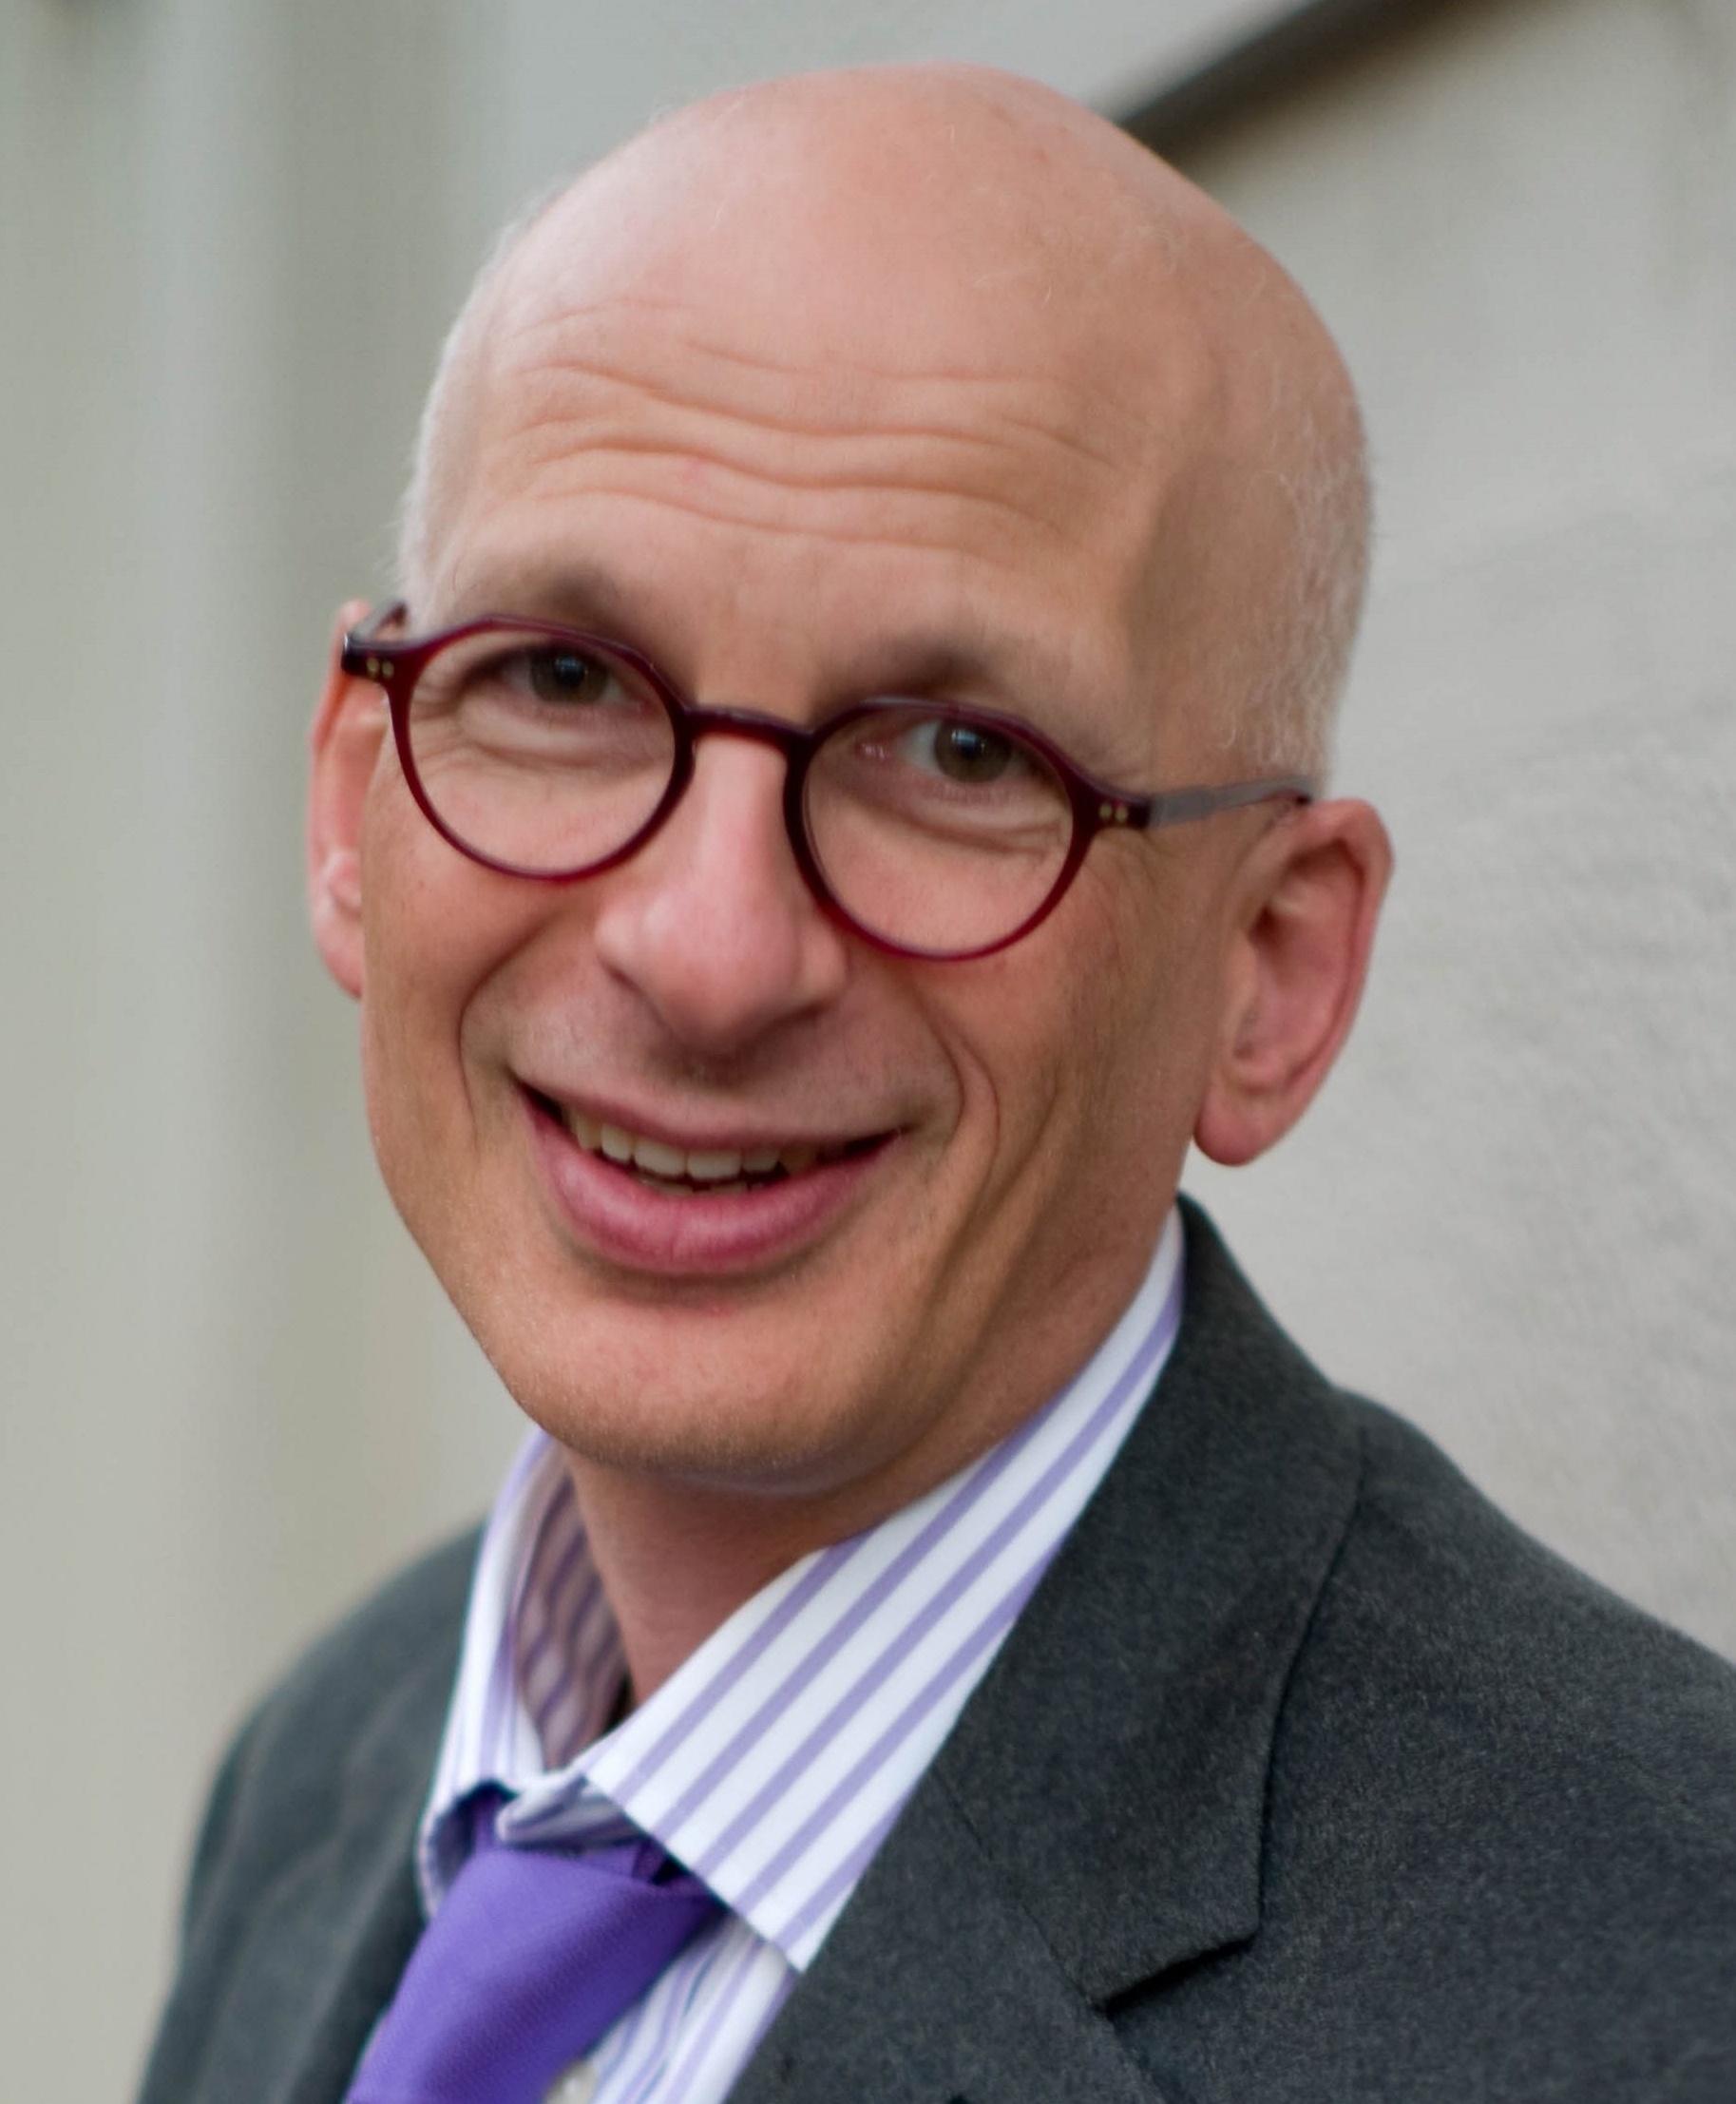 Seth Godin Financial Advisor Marketing